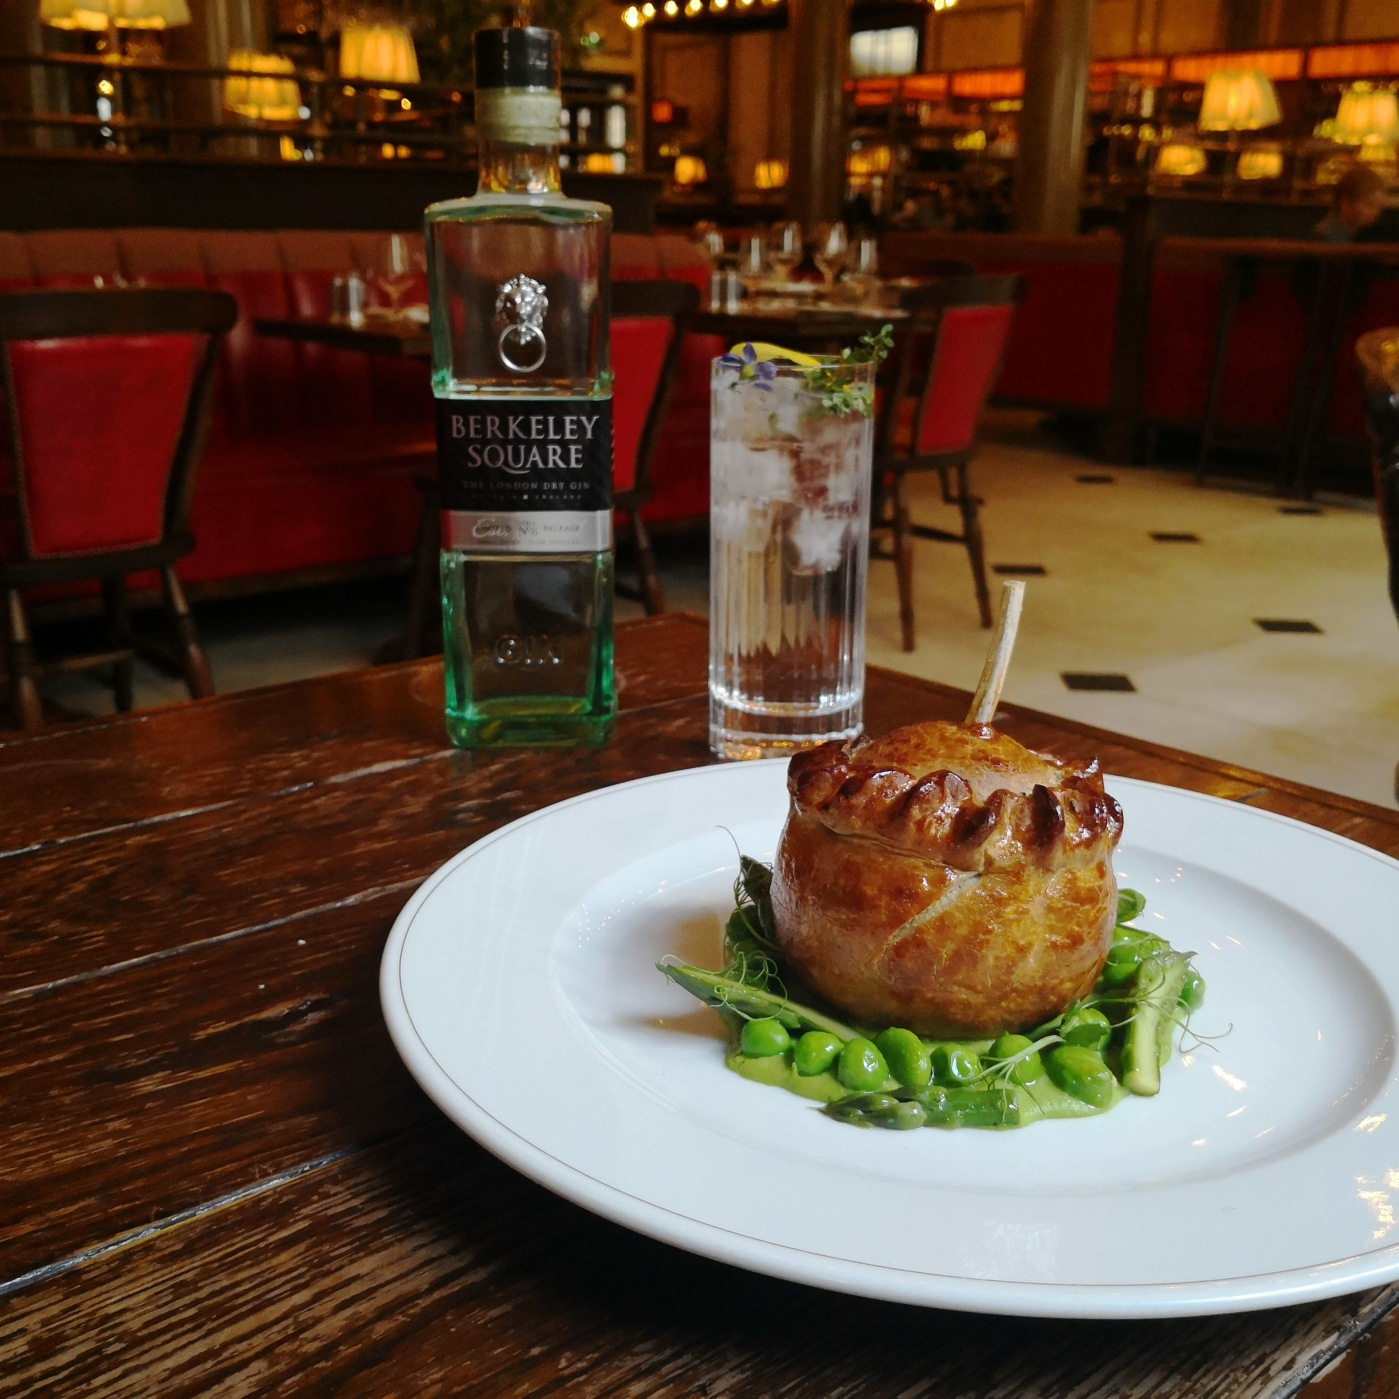 Holborn Dining Room_Royal Wedding Pie & Cocktail_01.05.2018.jpg